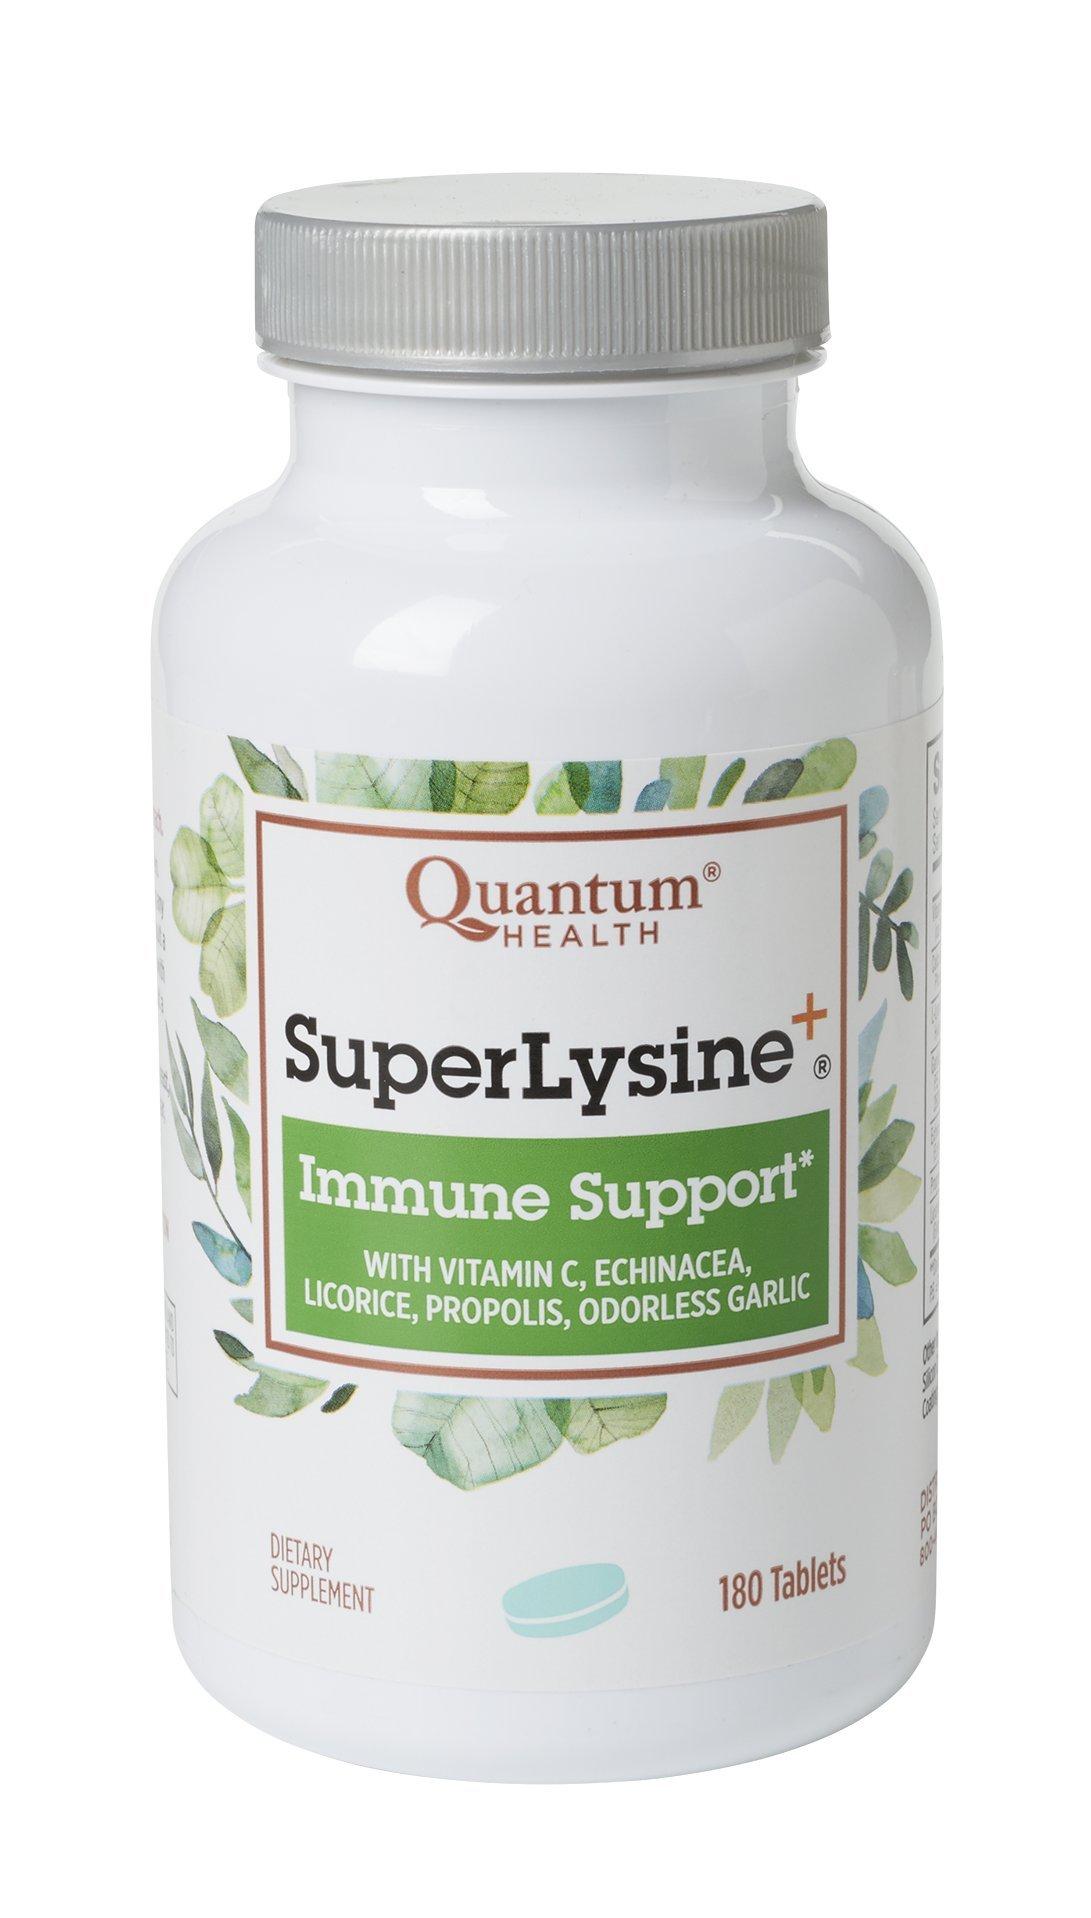 Quantum Health Super Lysine+ / Advanced Formula Lysine+ Immune Support with Vitamin C, Echinacea, Licorice, Propolis, Odorless Garlic (180 Tablets) by Quantum